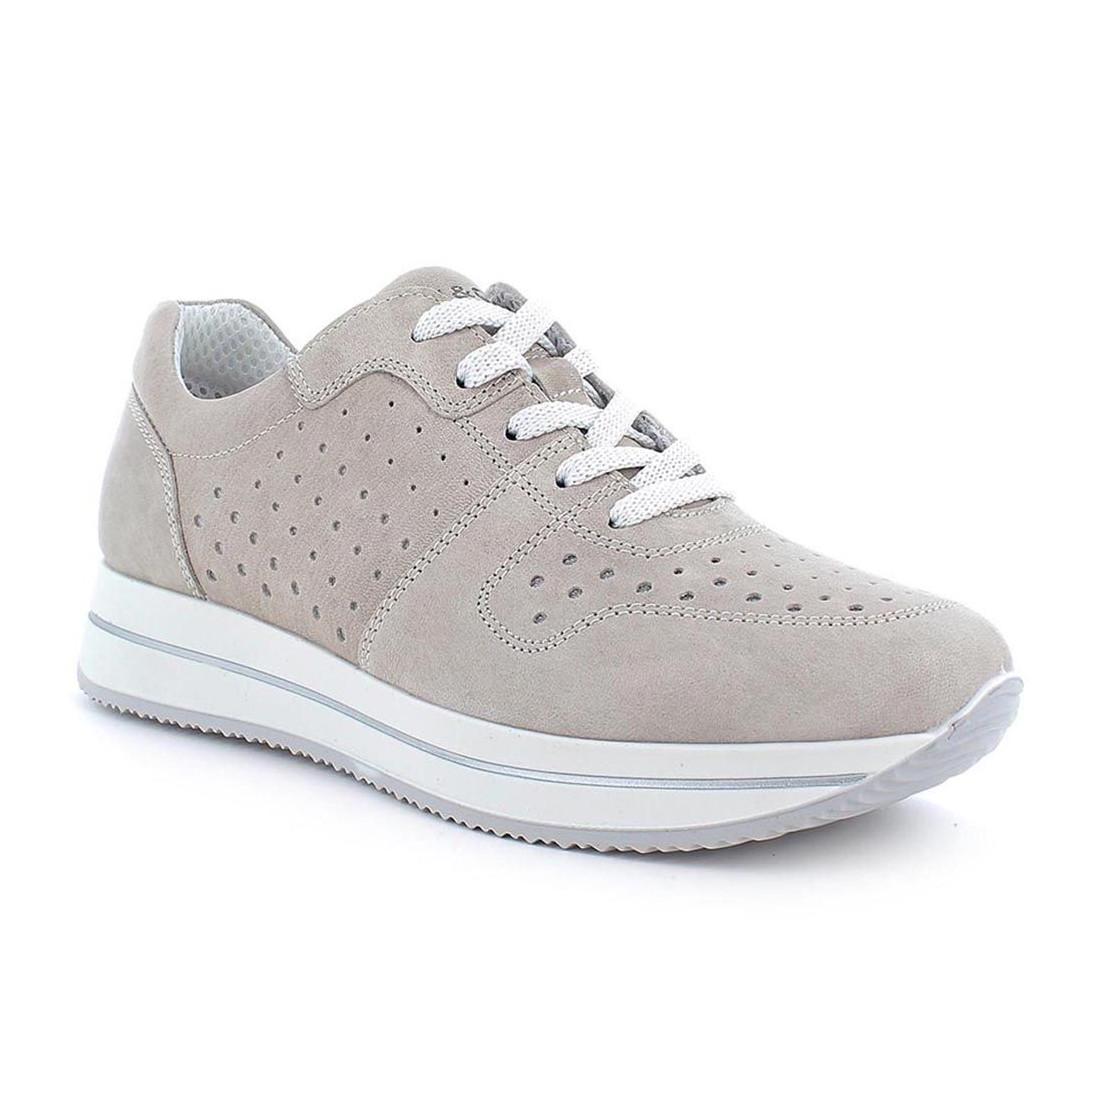 sneakers donna igico kuga7151422 8509